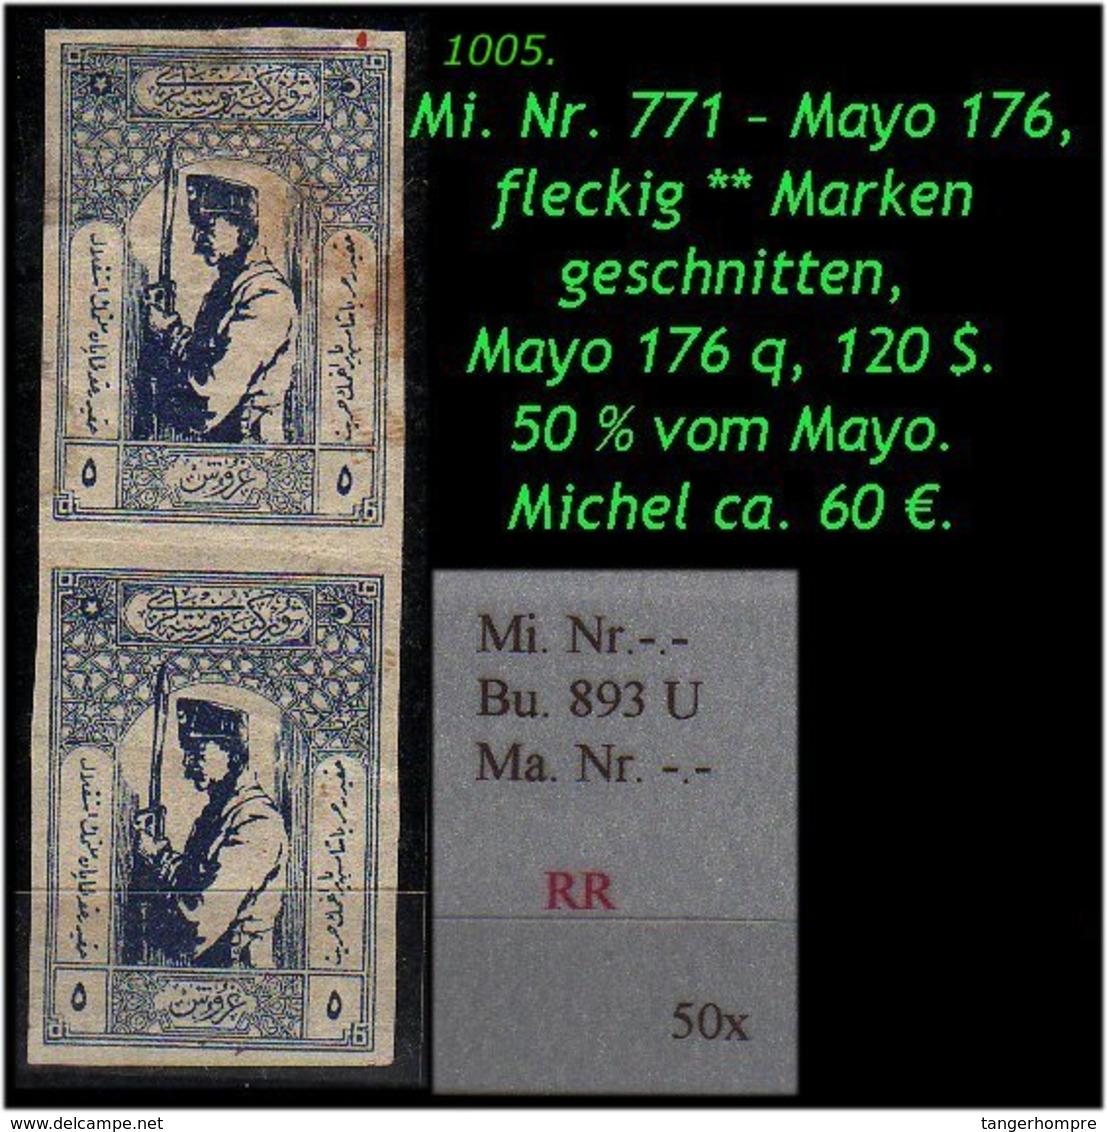 EARLY OTTOMAN SPECIALIZED FOR SPECIALIST, SEE...Mi. Nr. -.- - Burak 893 U - Mayo 176 -R- - Nuevos